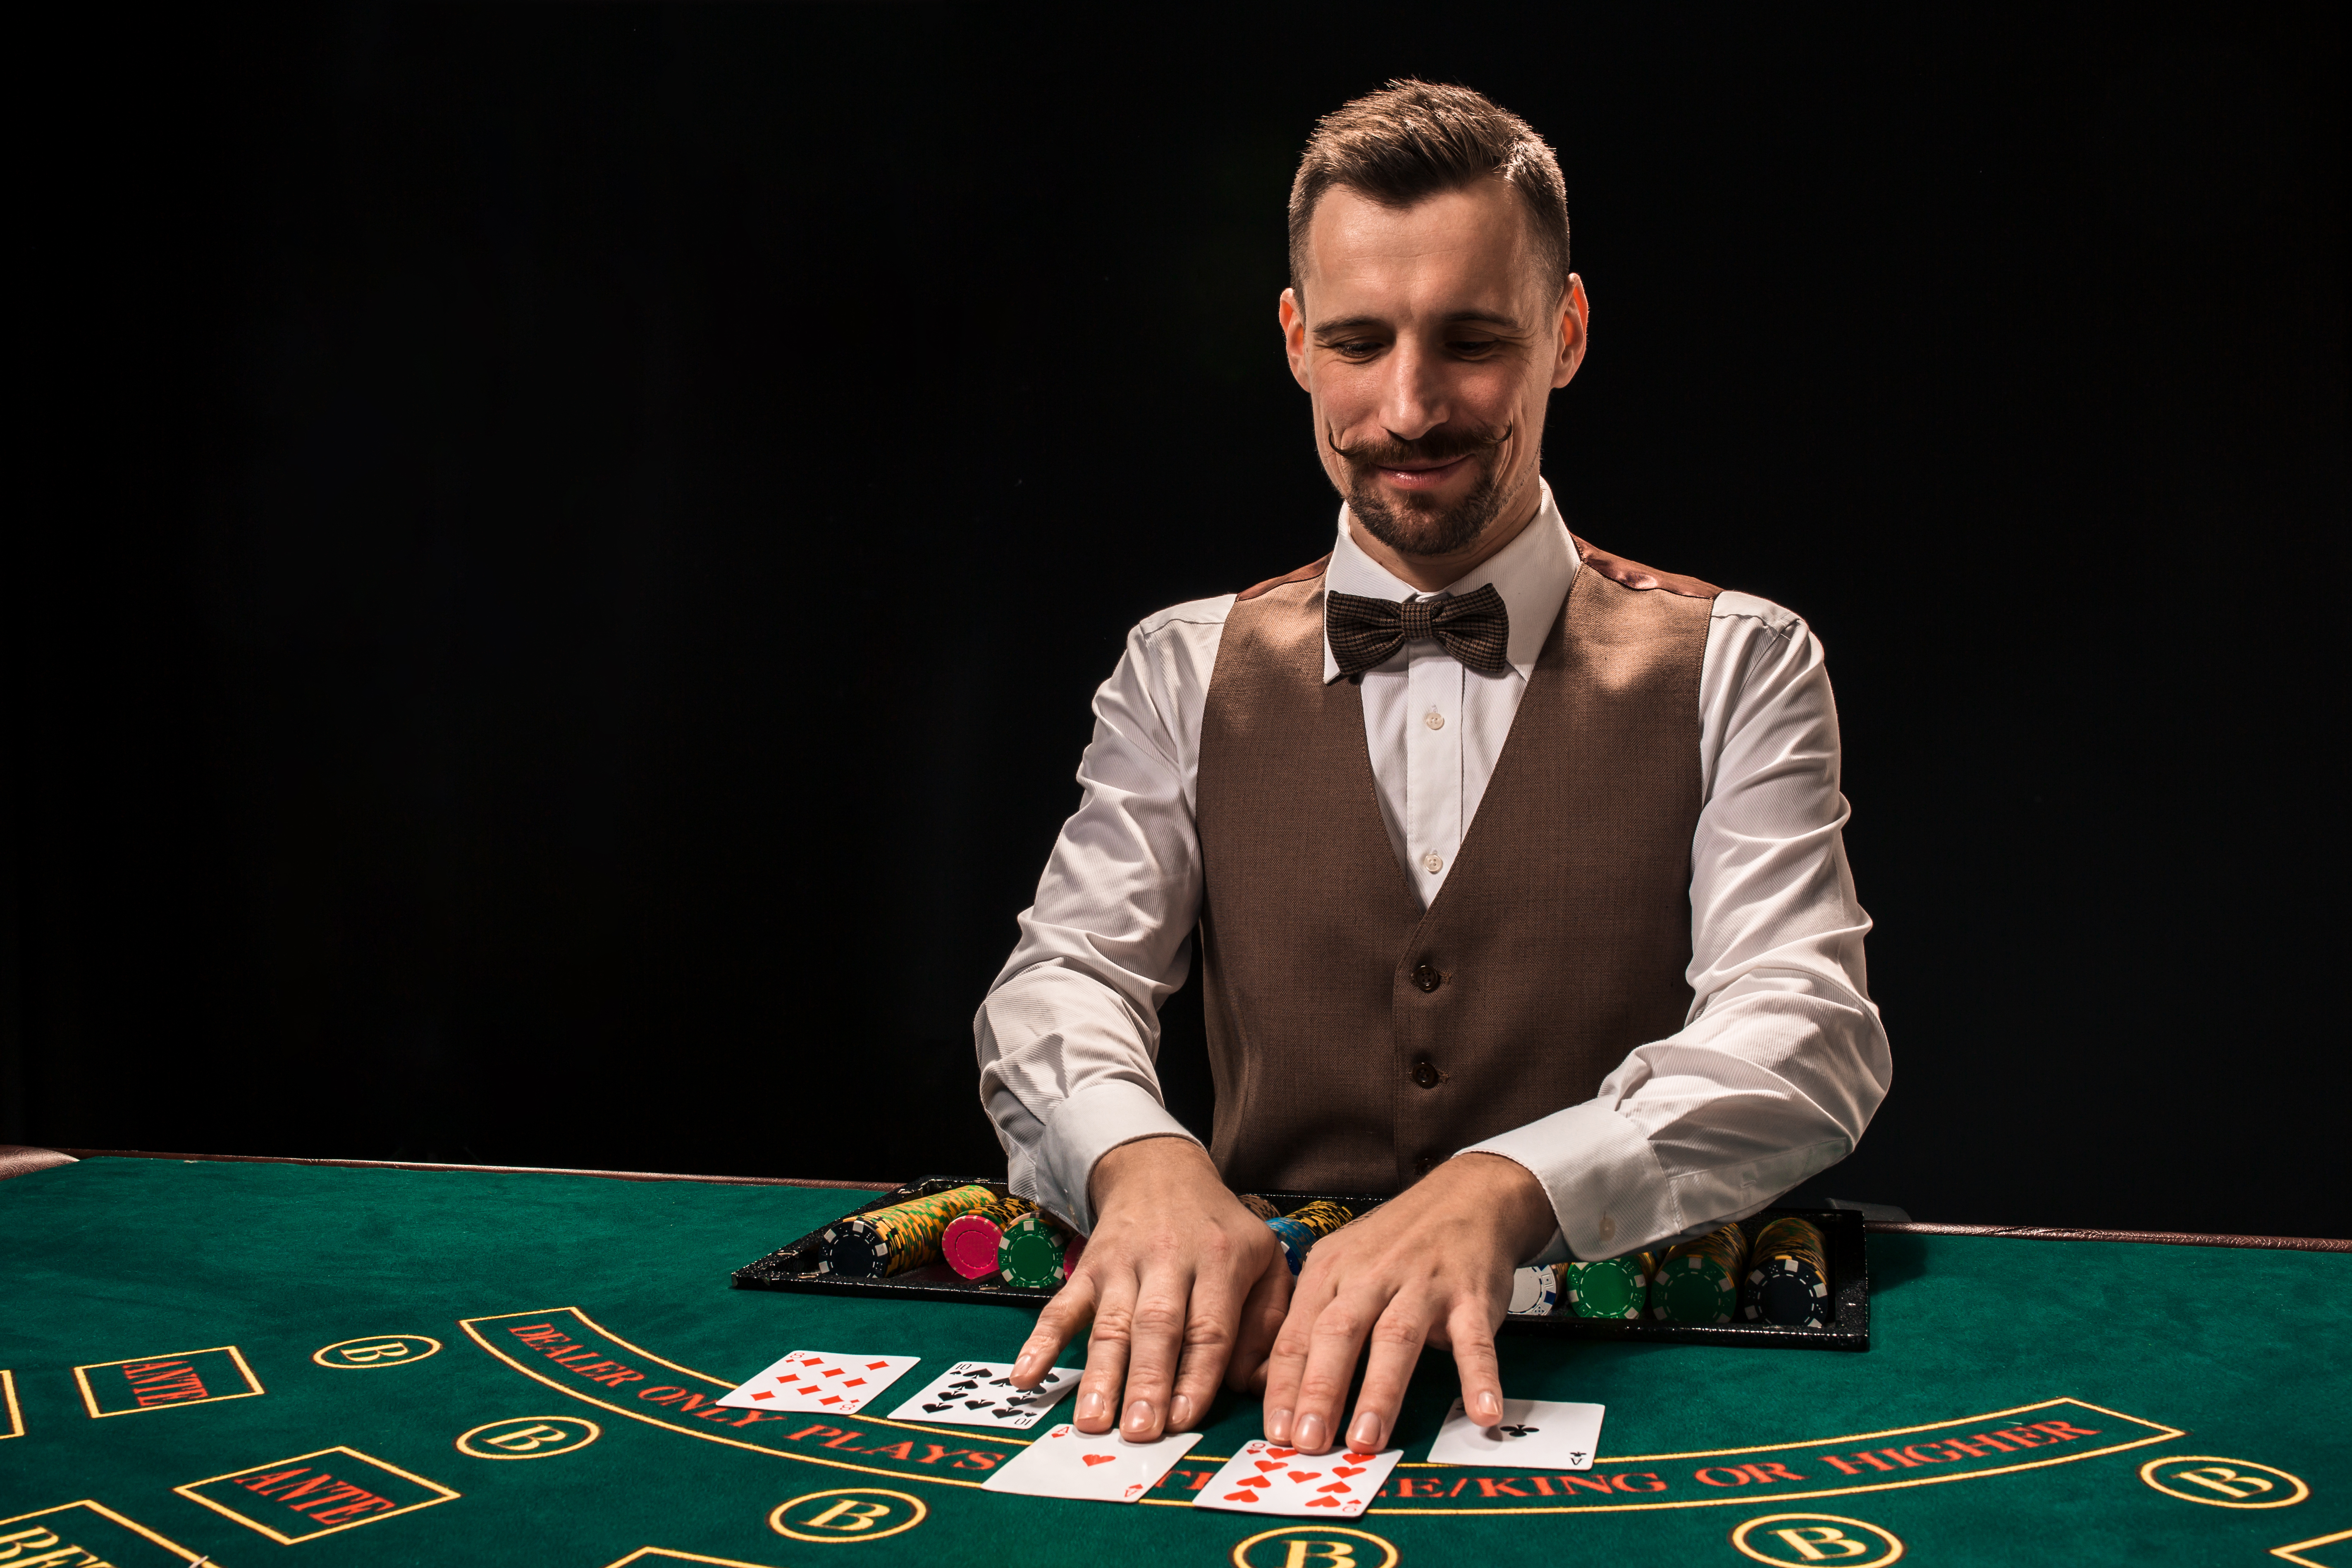 Casinos hiring poker dealers bonus casino code deposit no